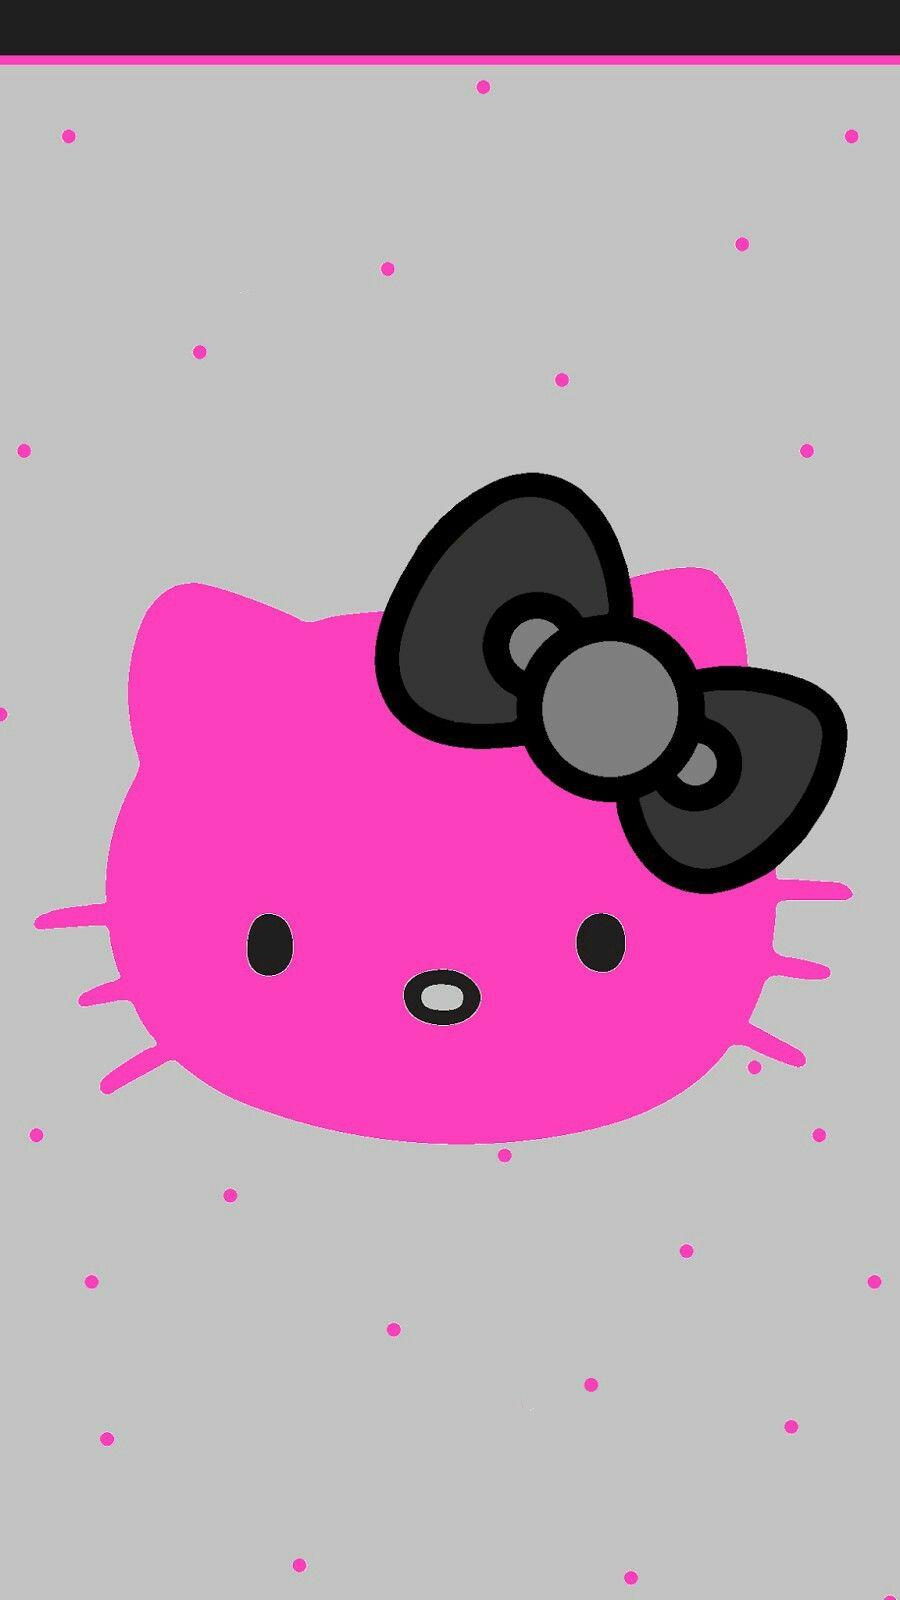 Cool Wallpaper Hello Kitty Gray - f92a5bb315e3721c8bebd549026cdbc3  Best Photo Reference_346528.jpg